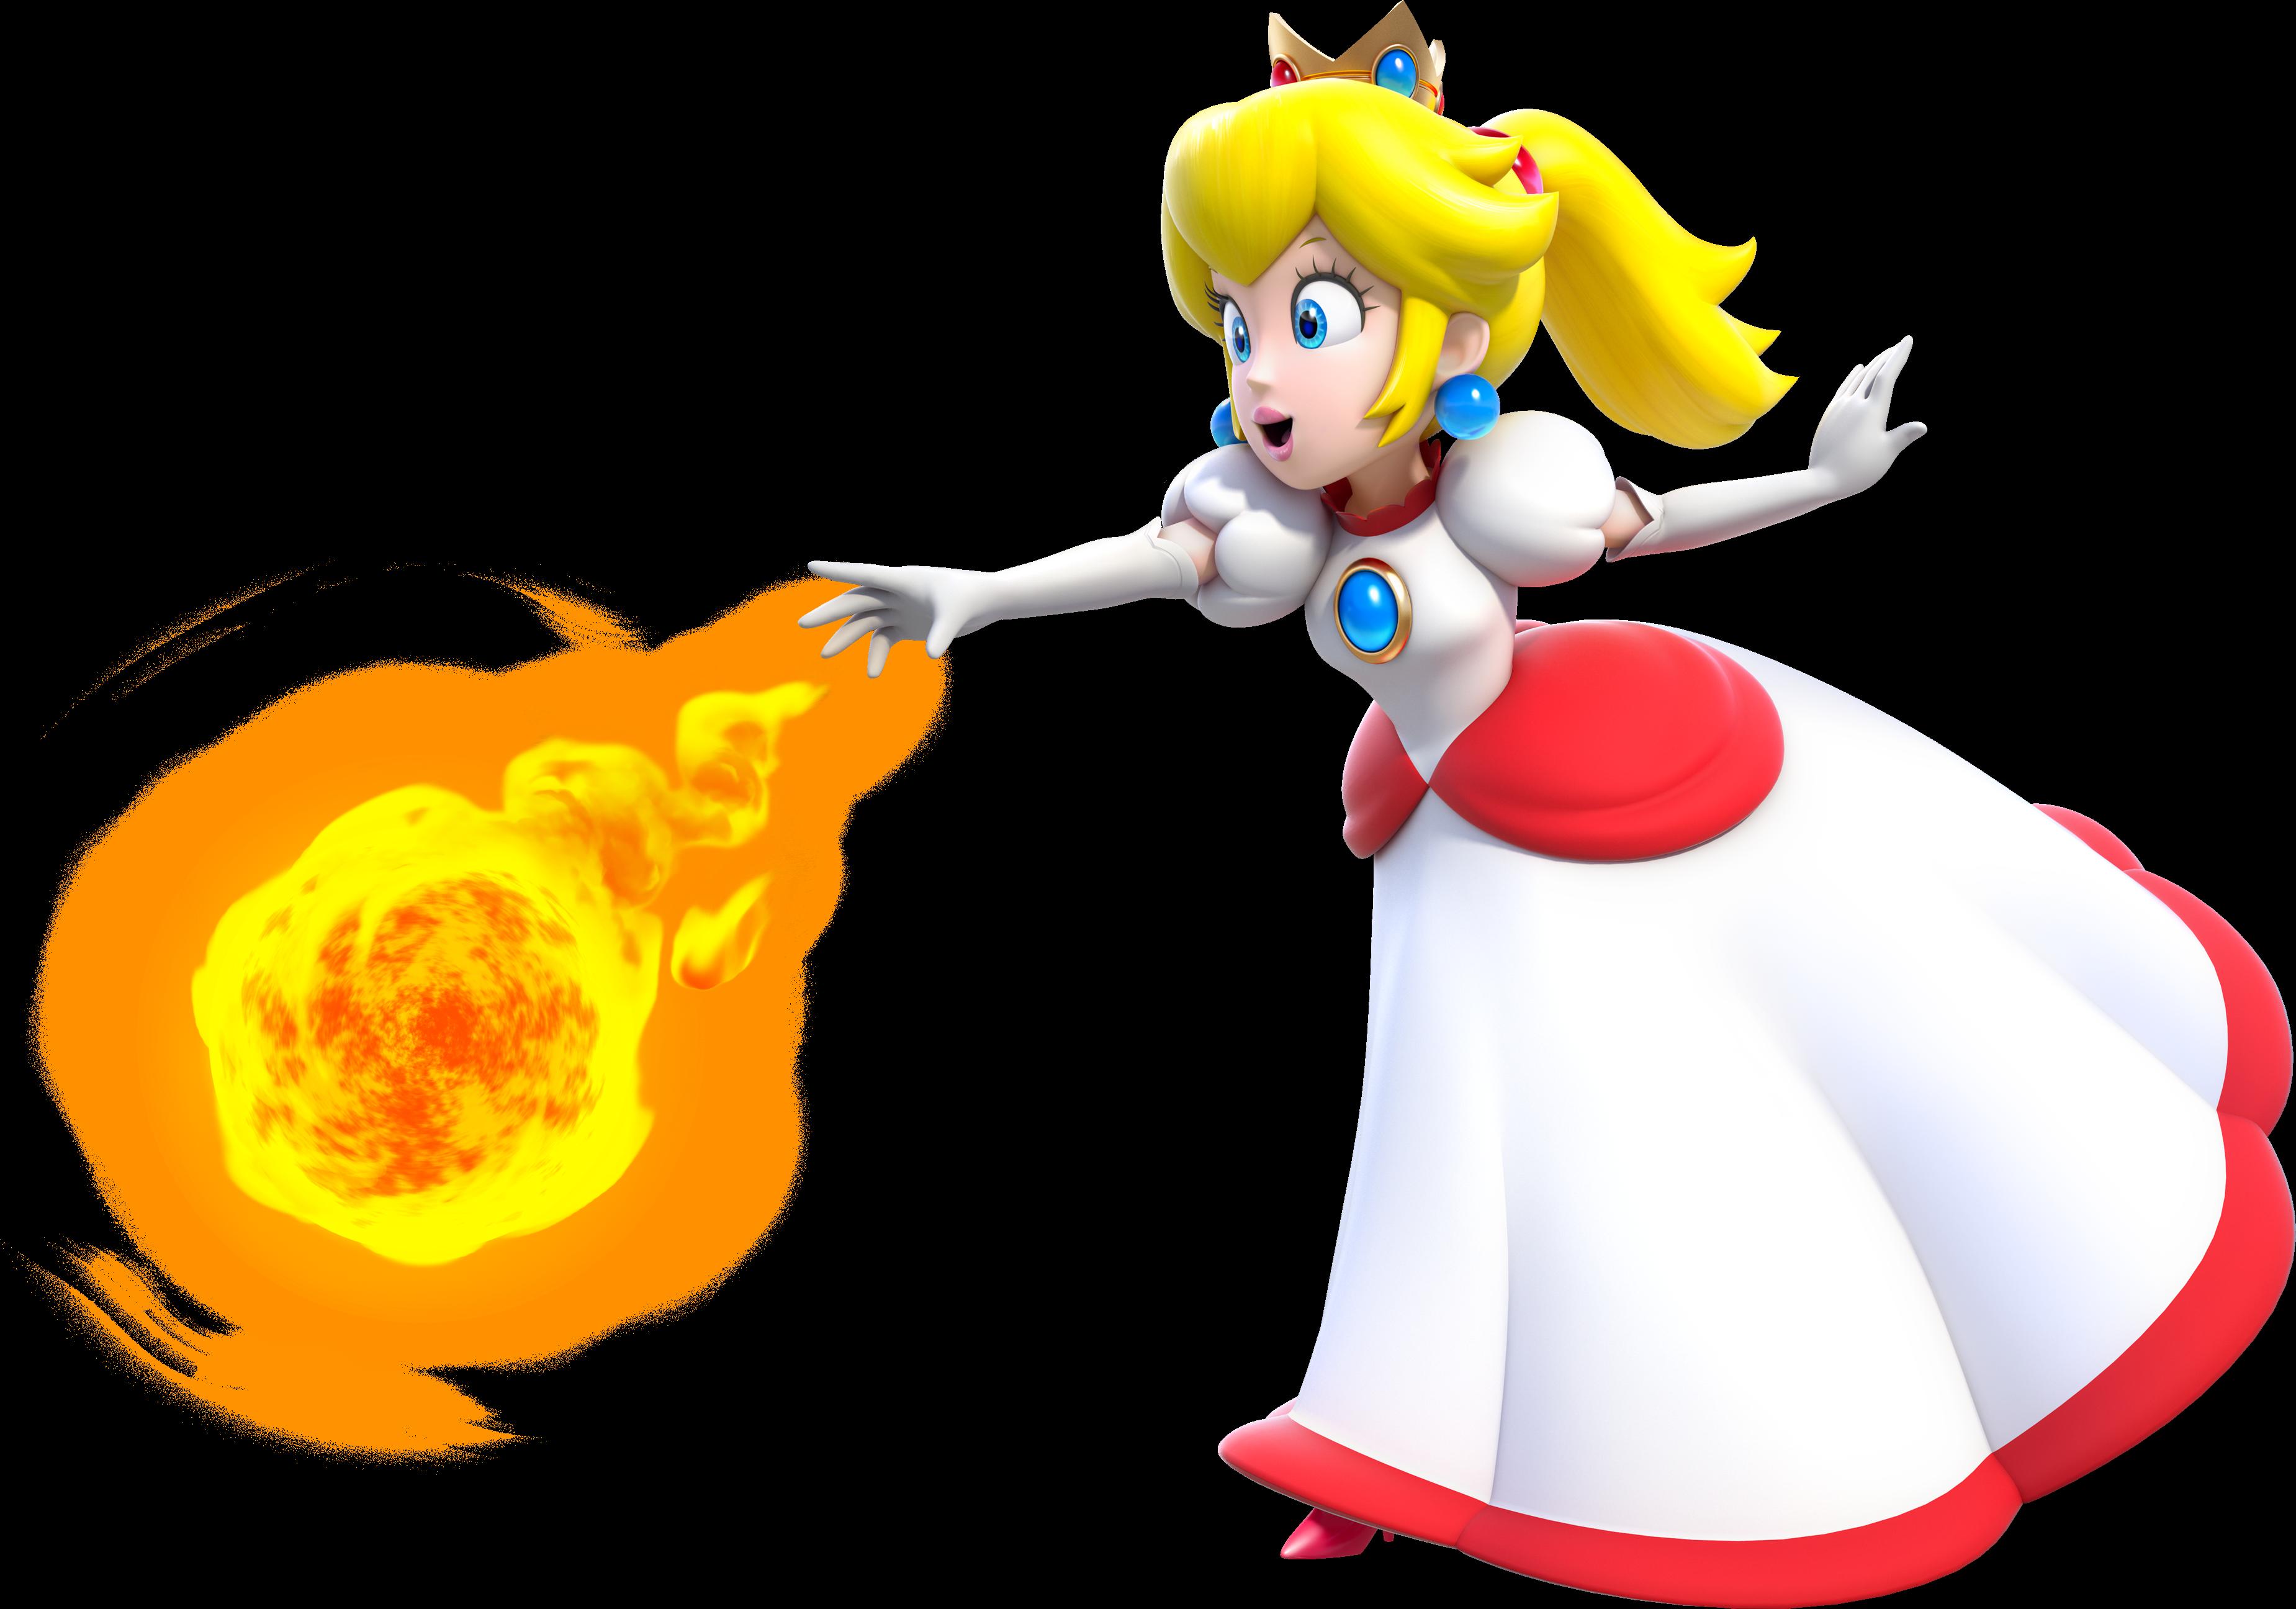 Fireflower Princess Peach